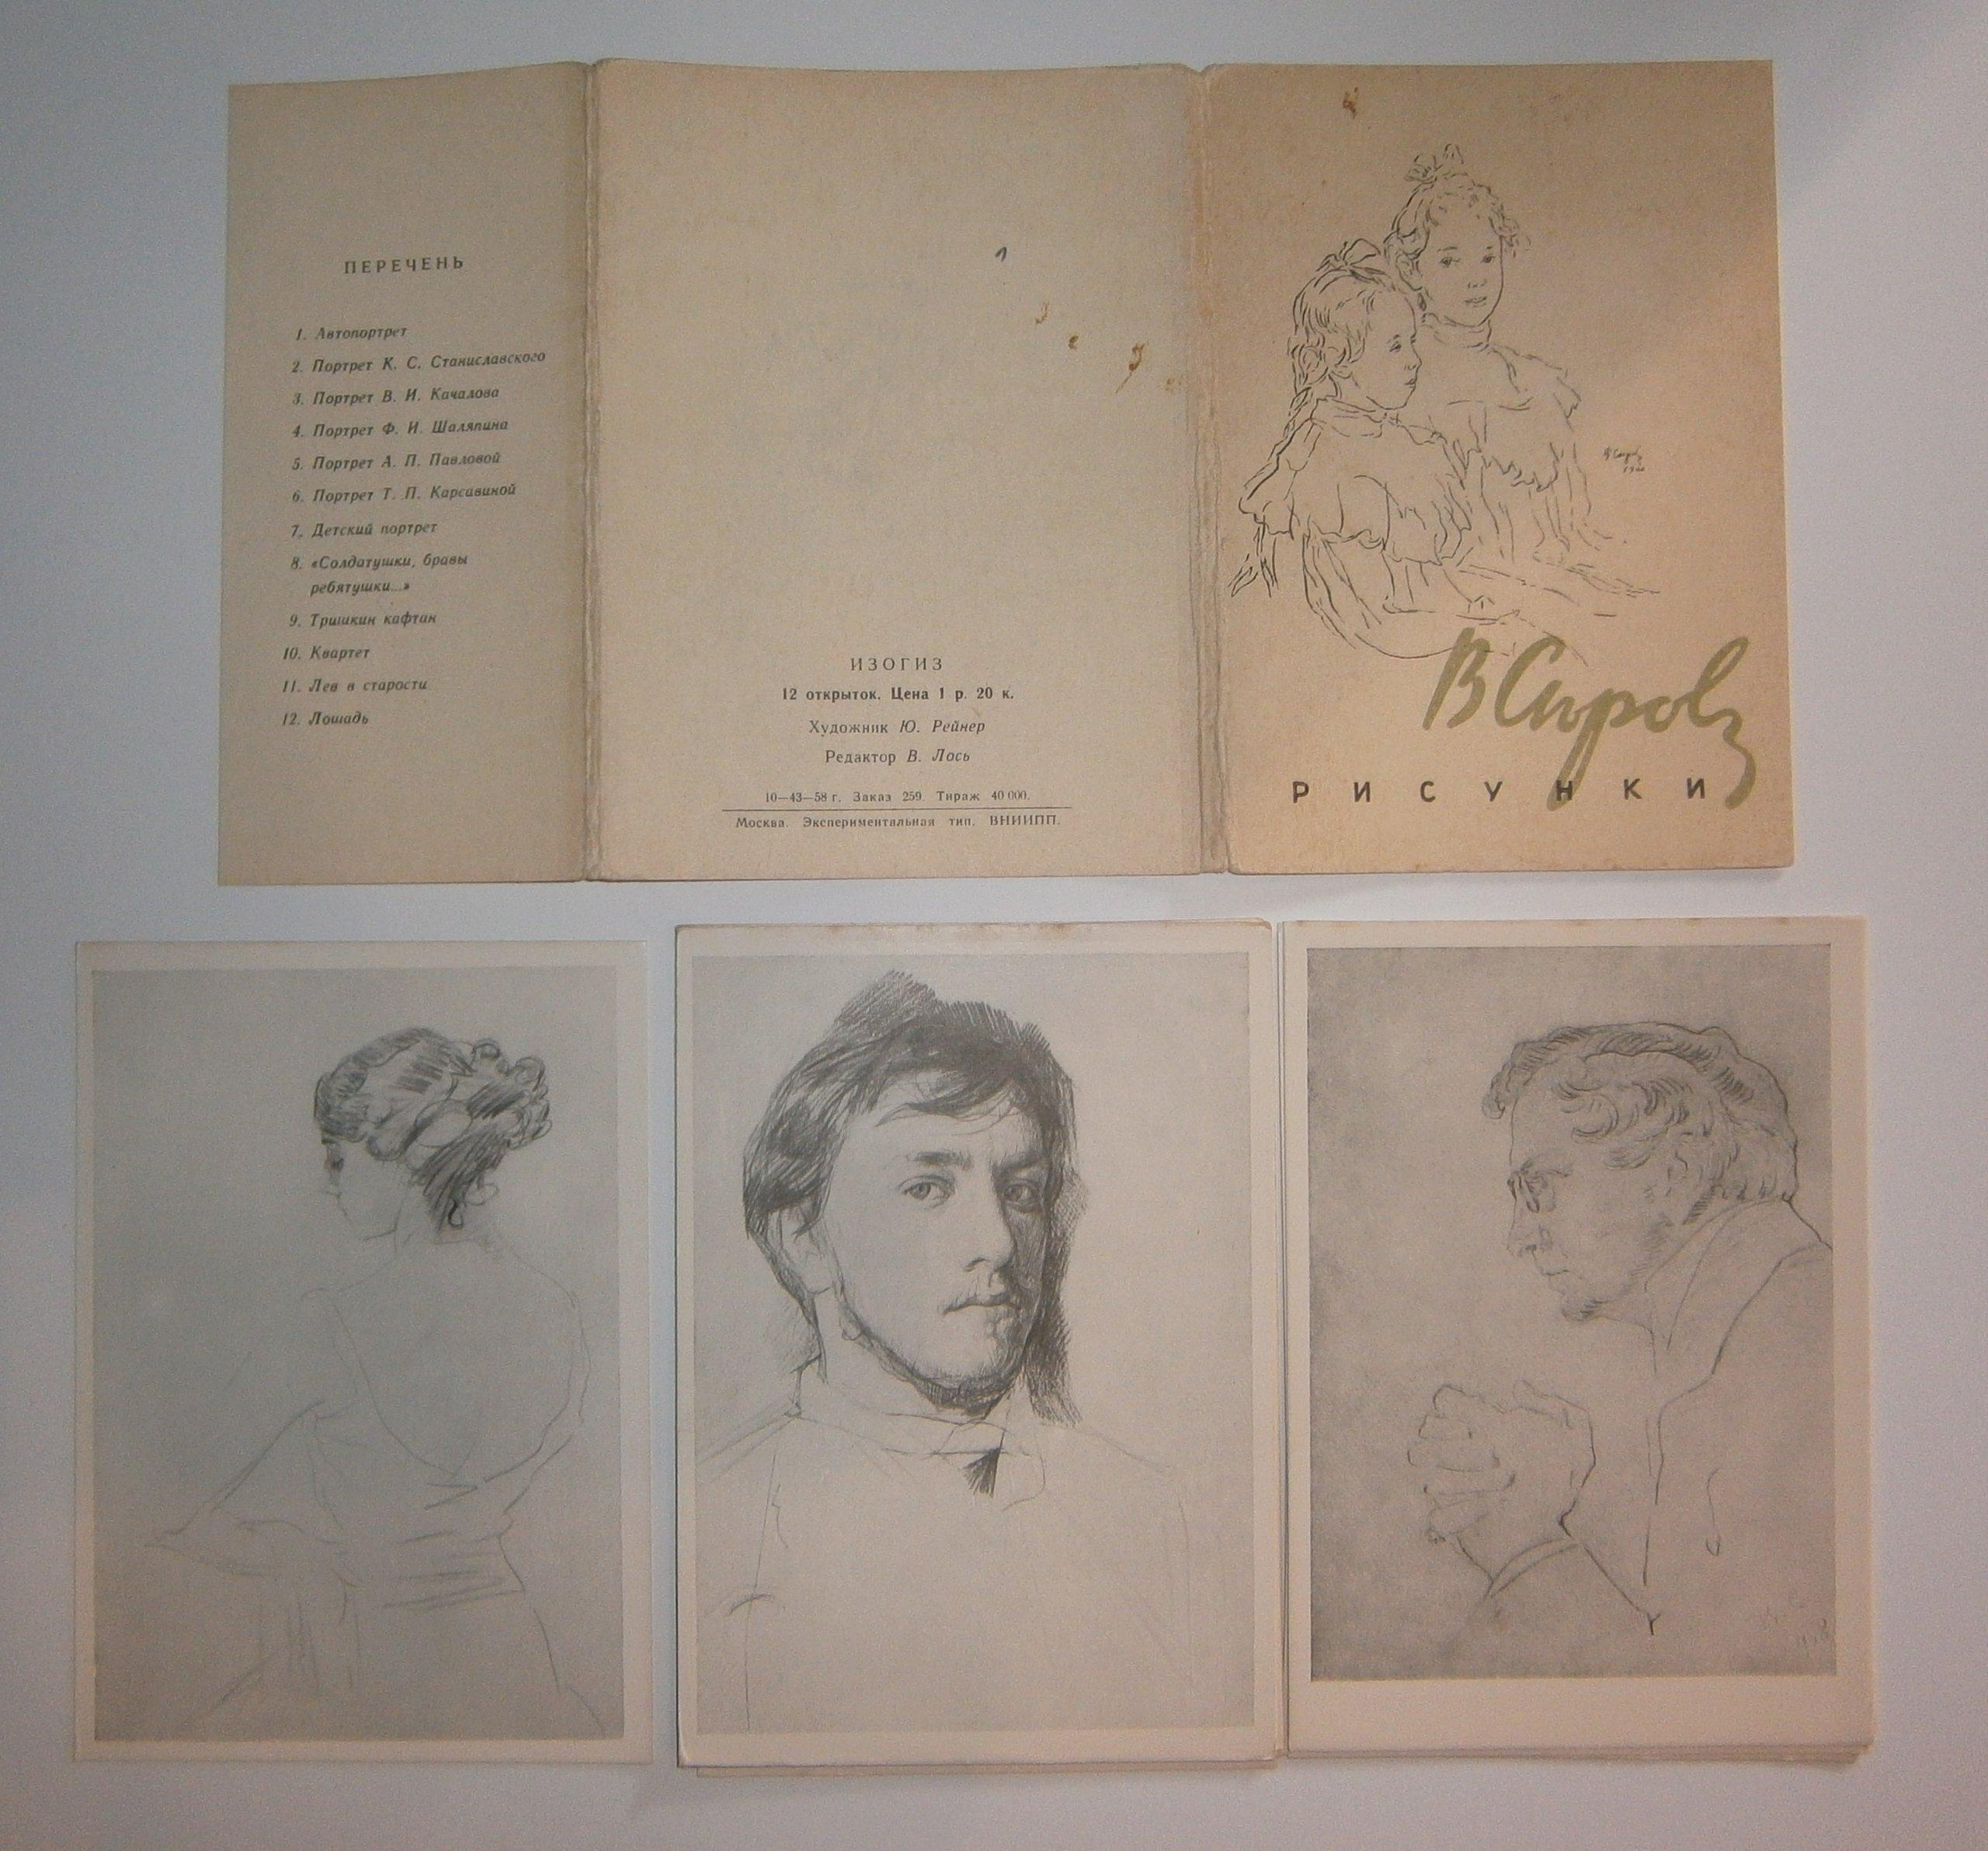 WALENTIN SIEREOW pohľadnice